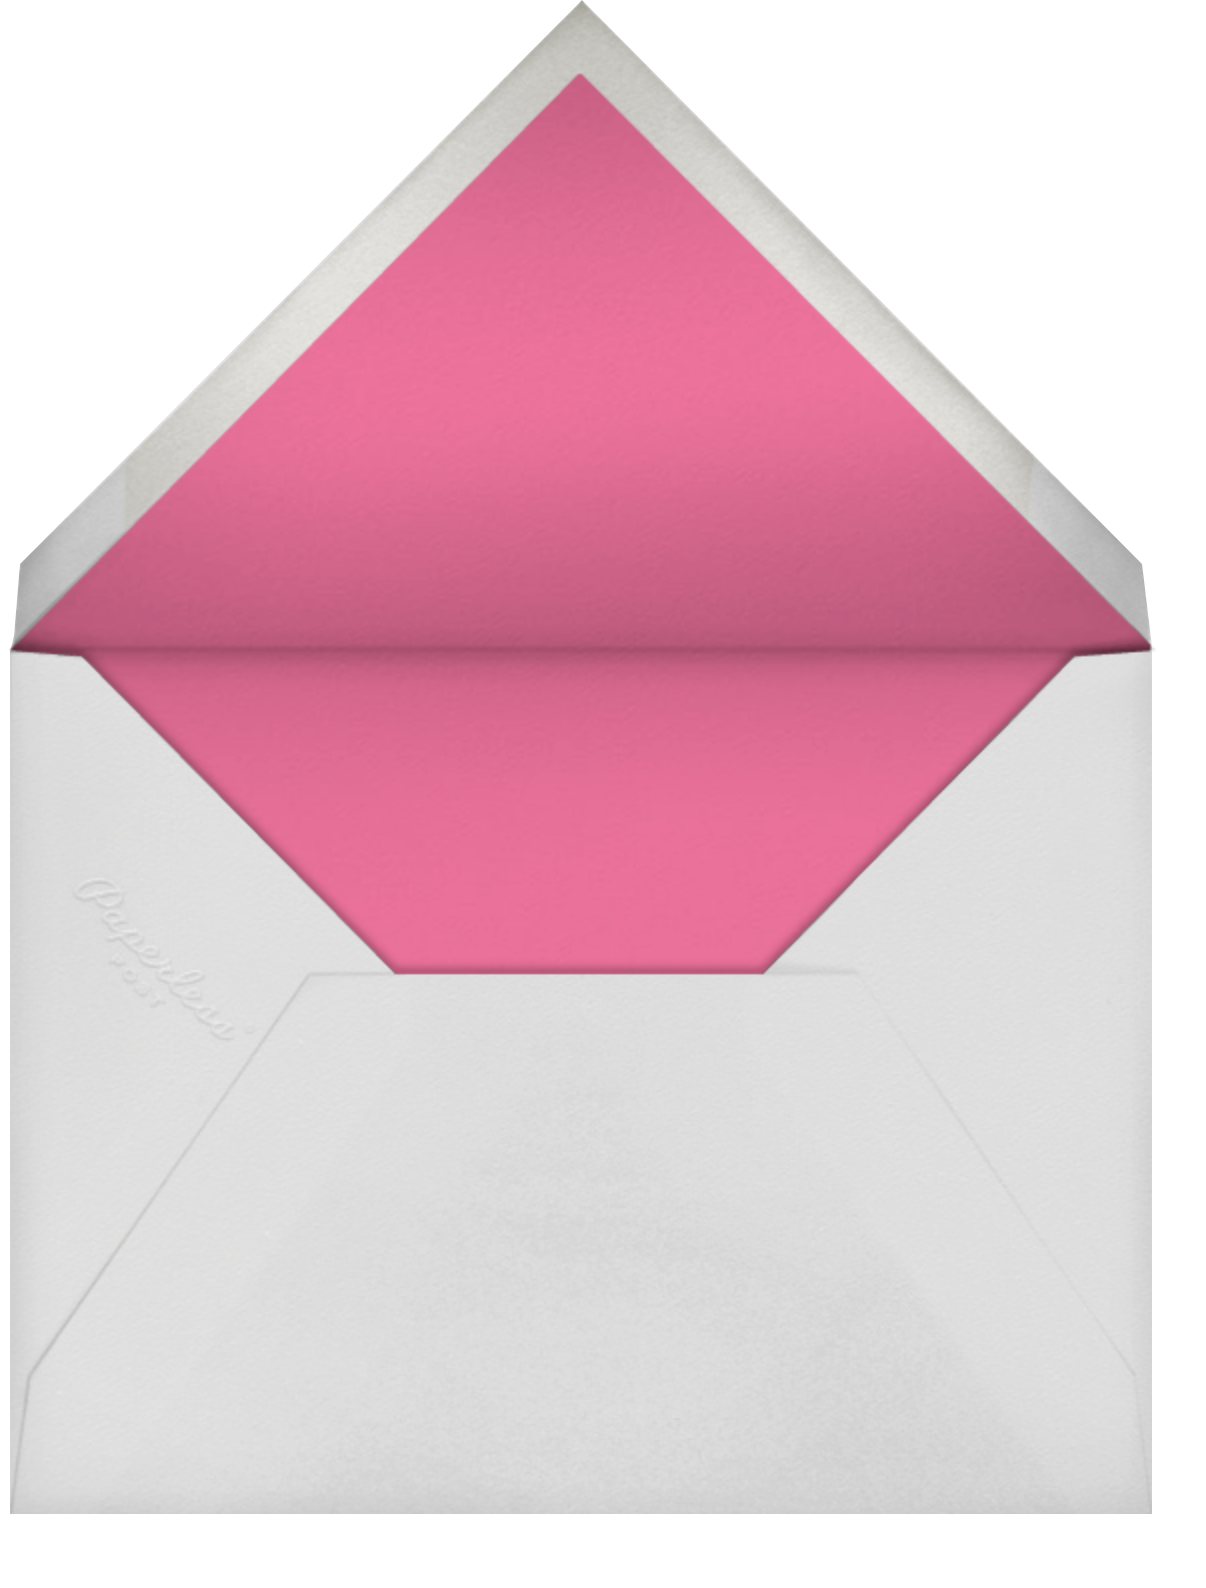 Llama with Balloons - Gray Malin - Adult birthday - envelope back